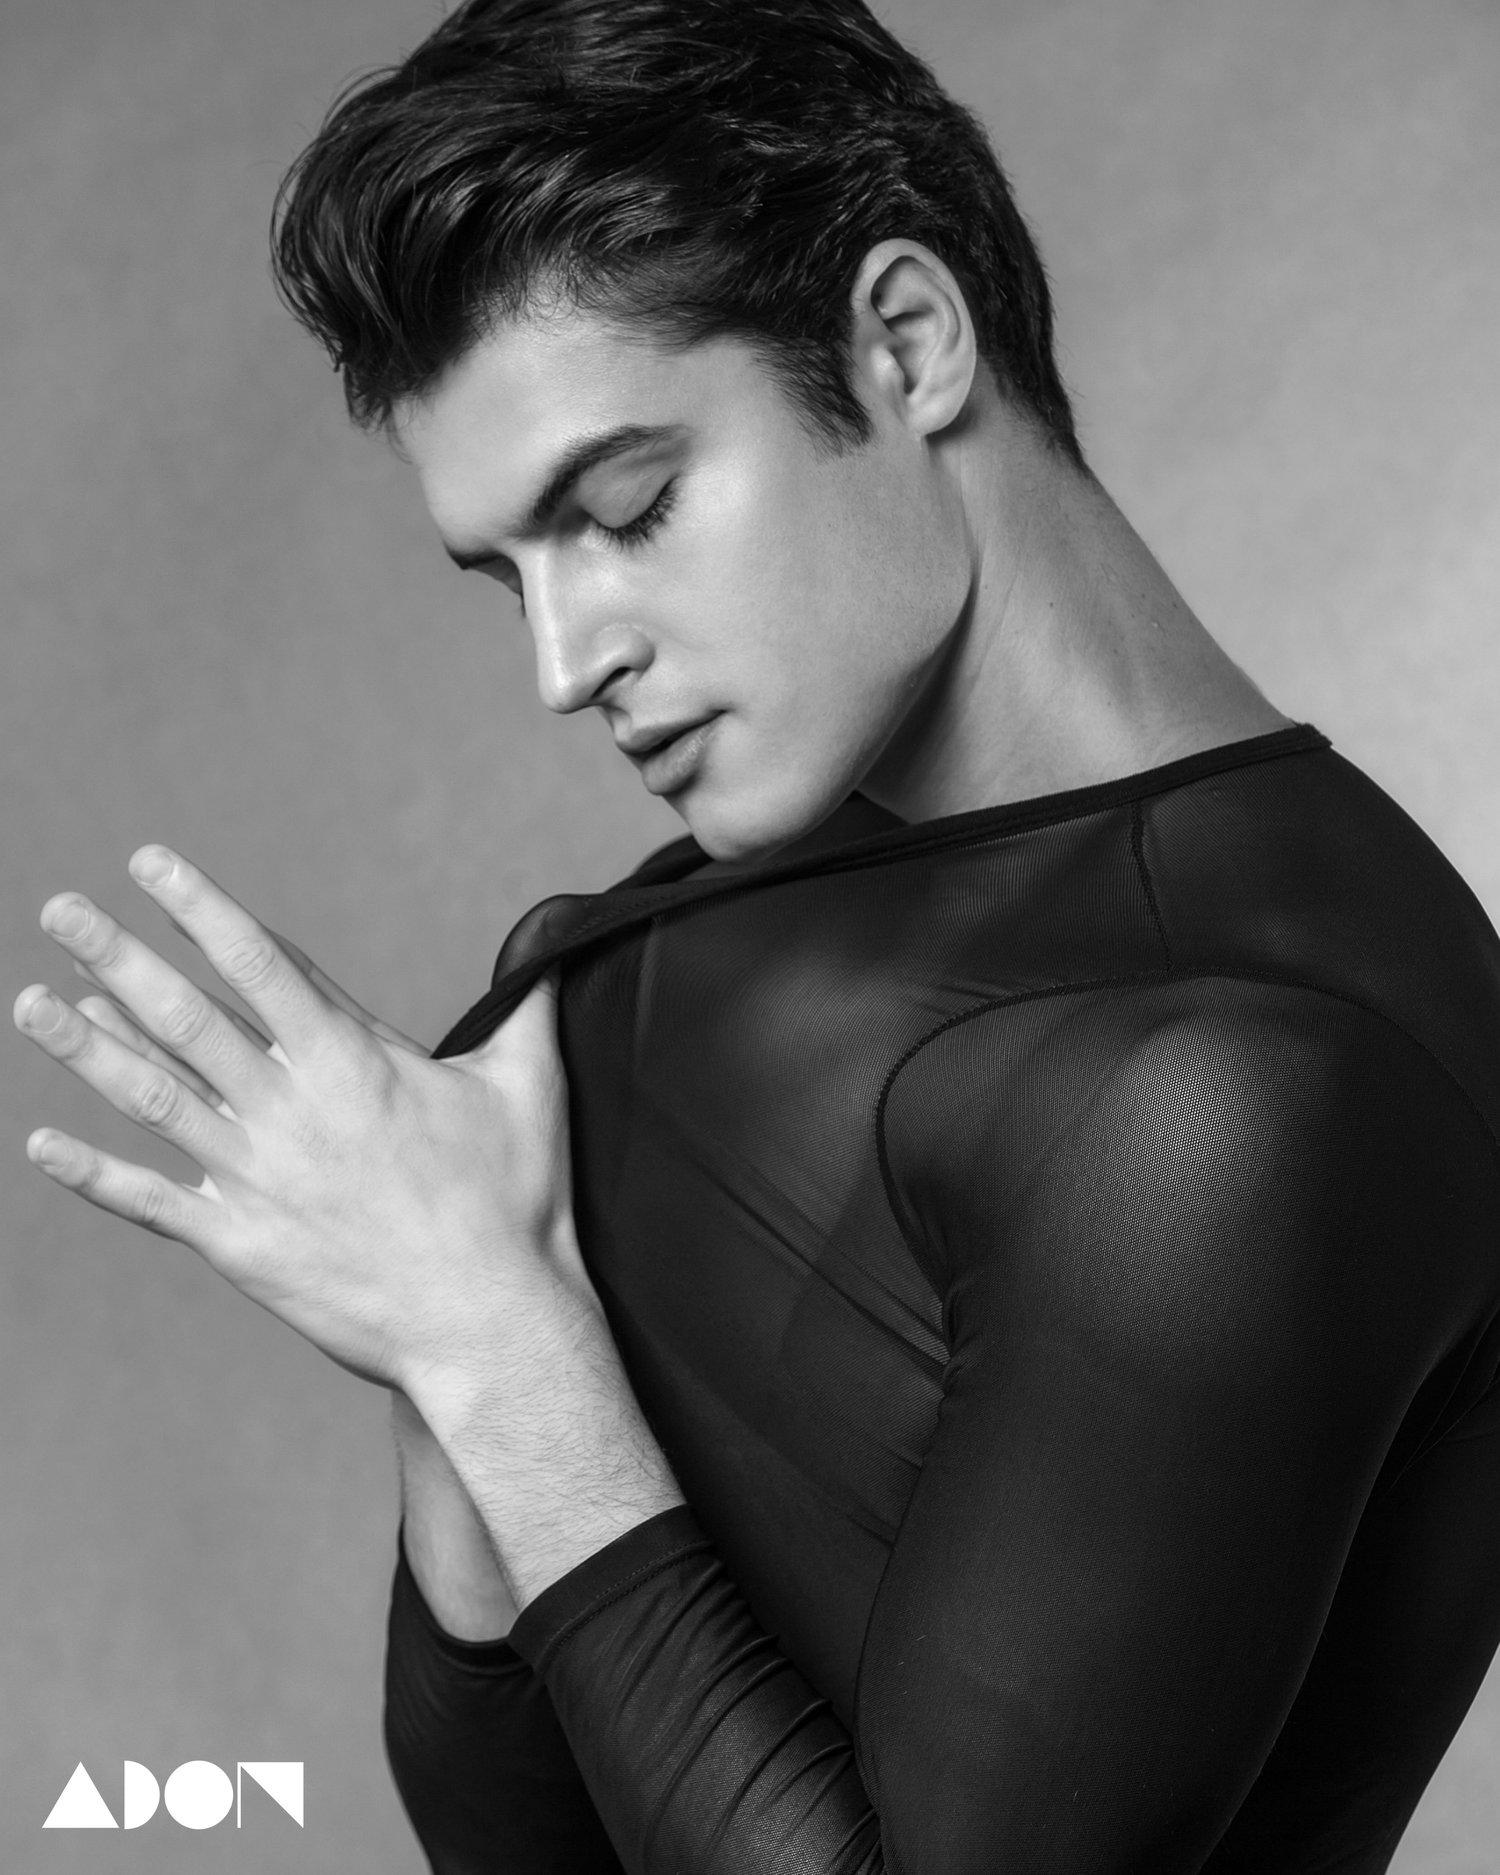 Adon Exclusive: Model Luka Skocilic By Jason Oung